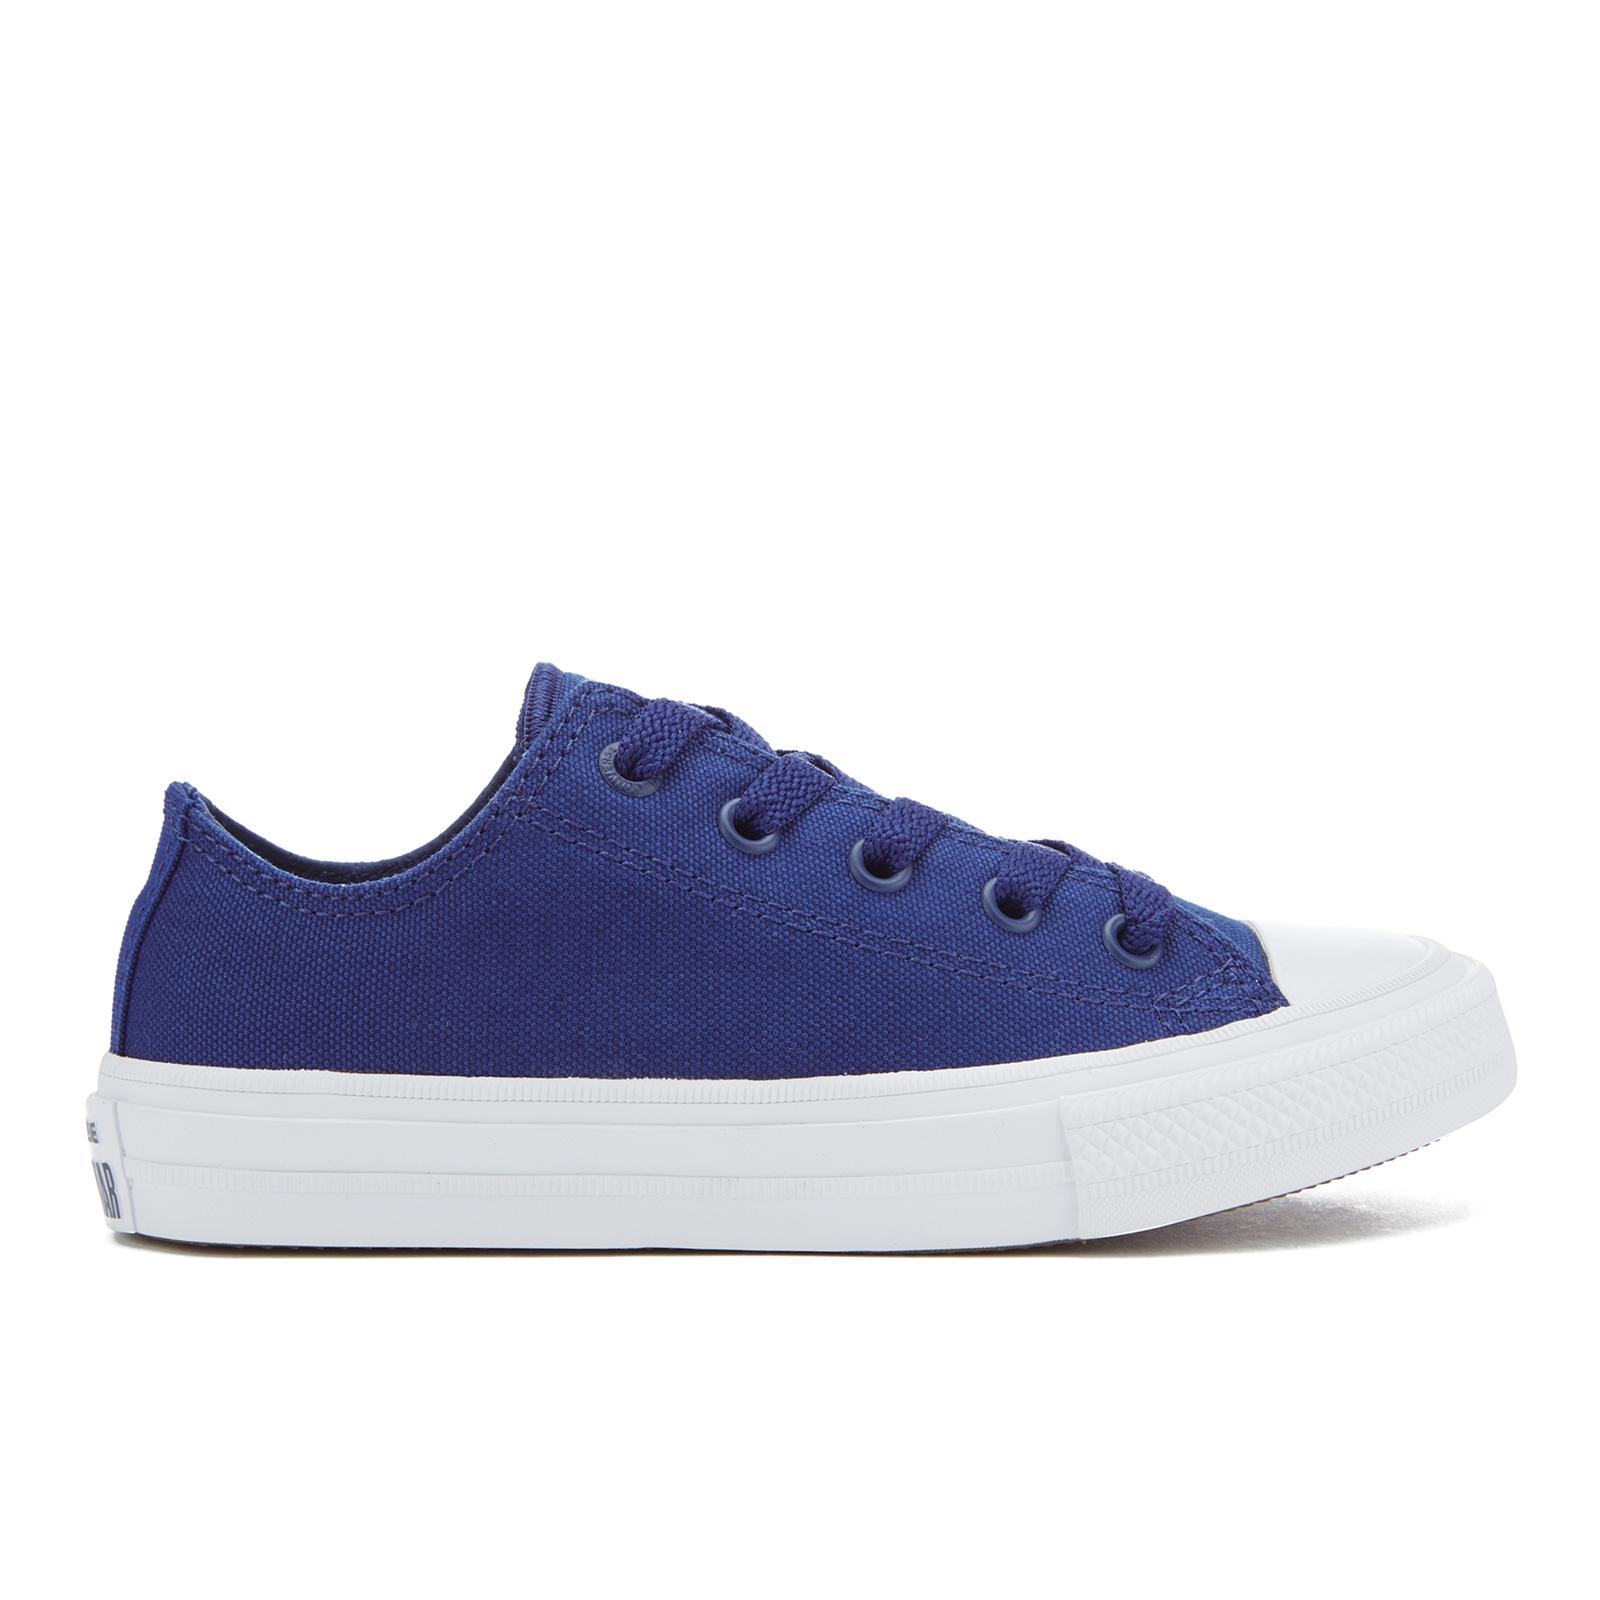 Converse Chuck Taylor® All Star II Ox Sodalite BlueWhite